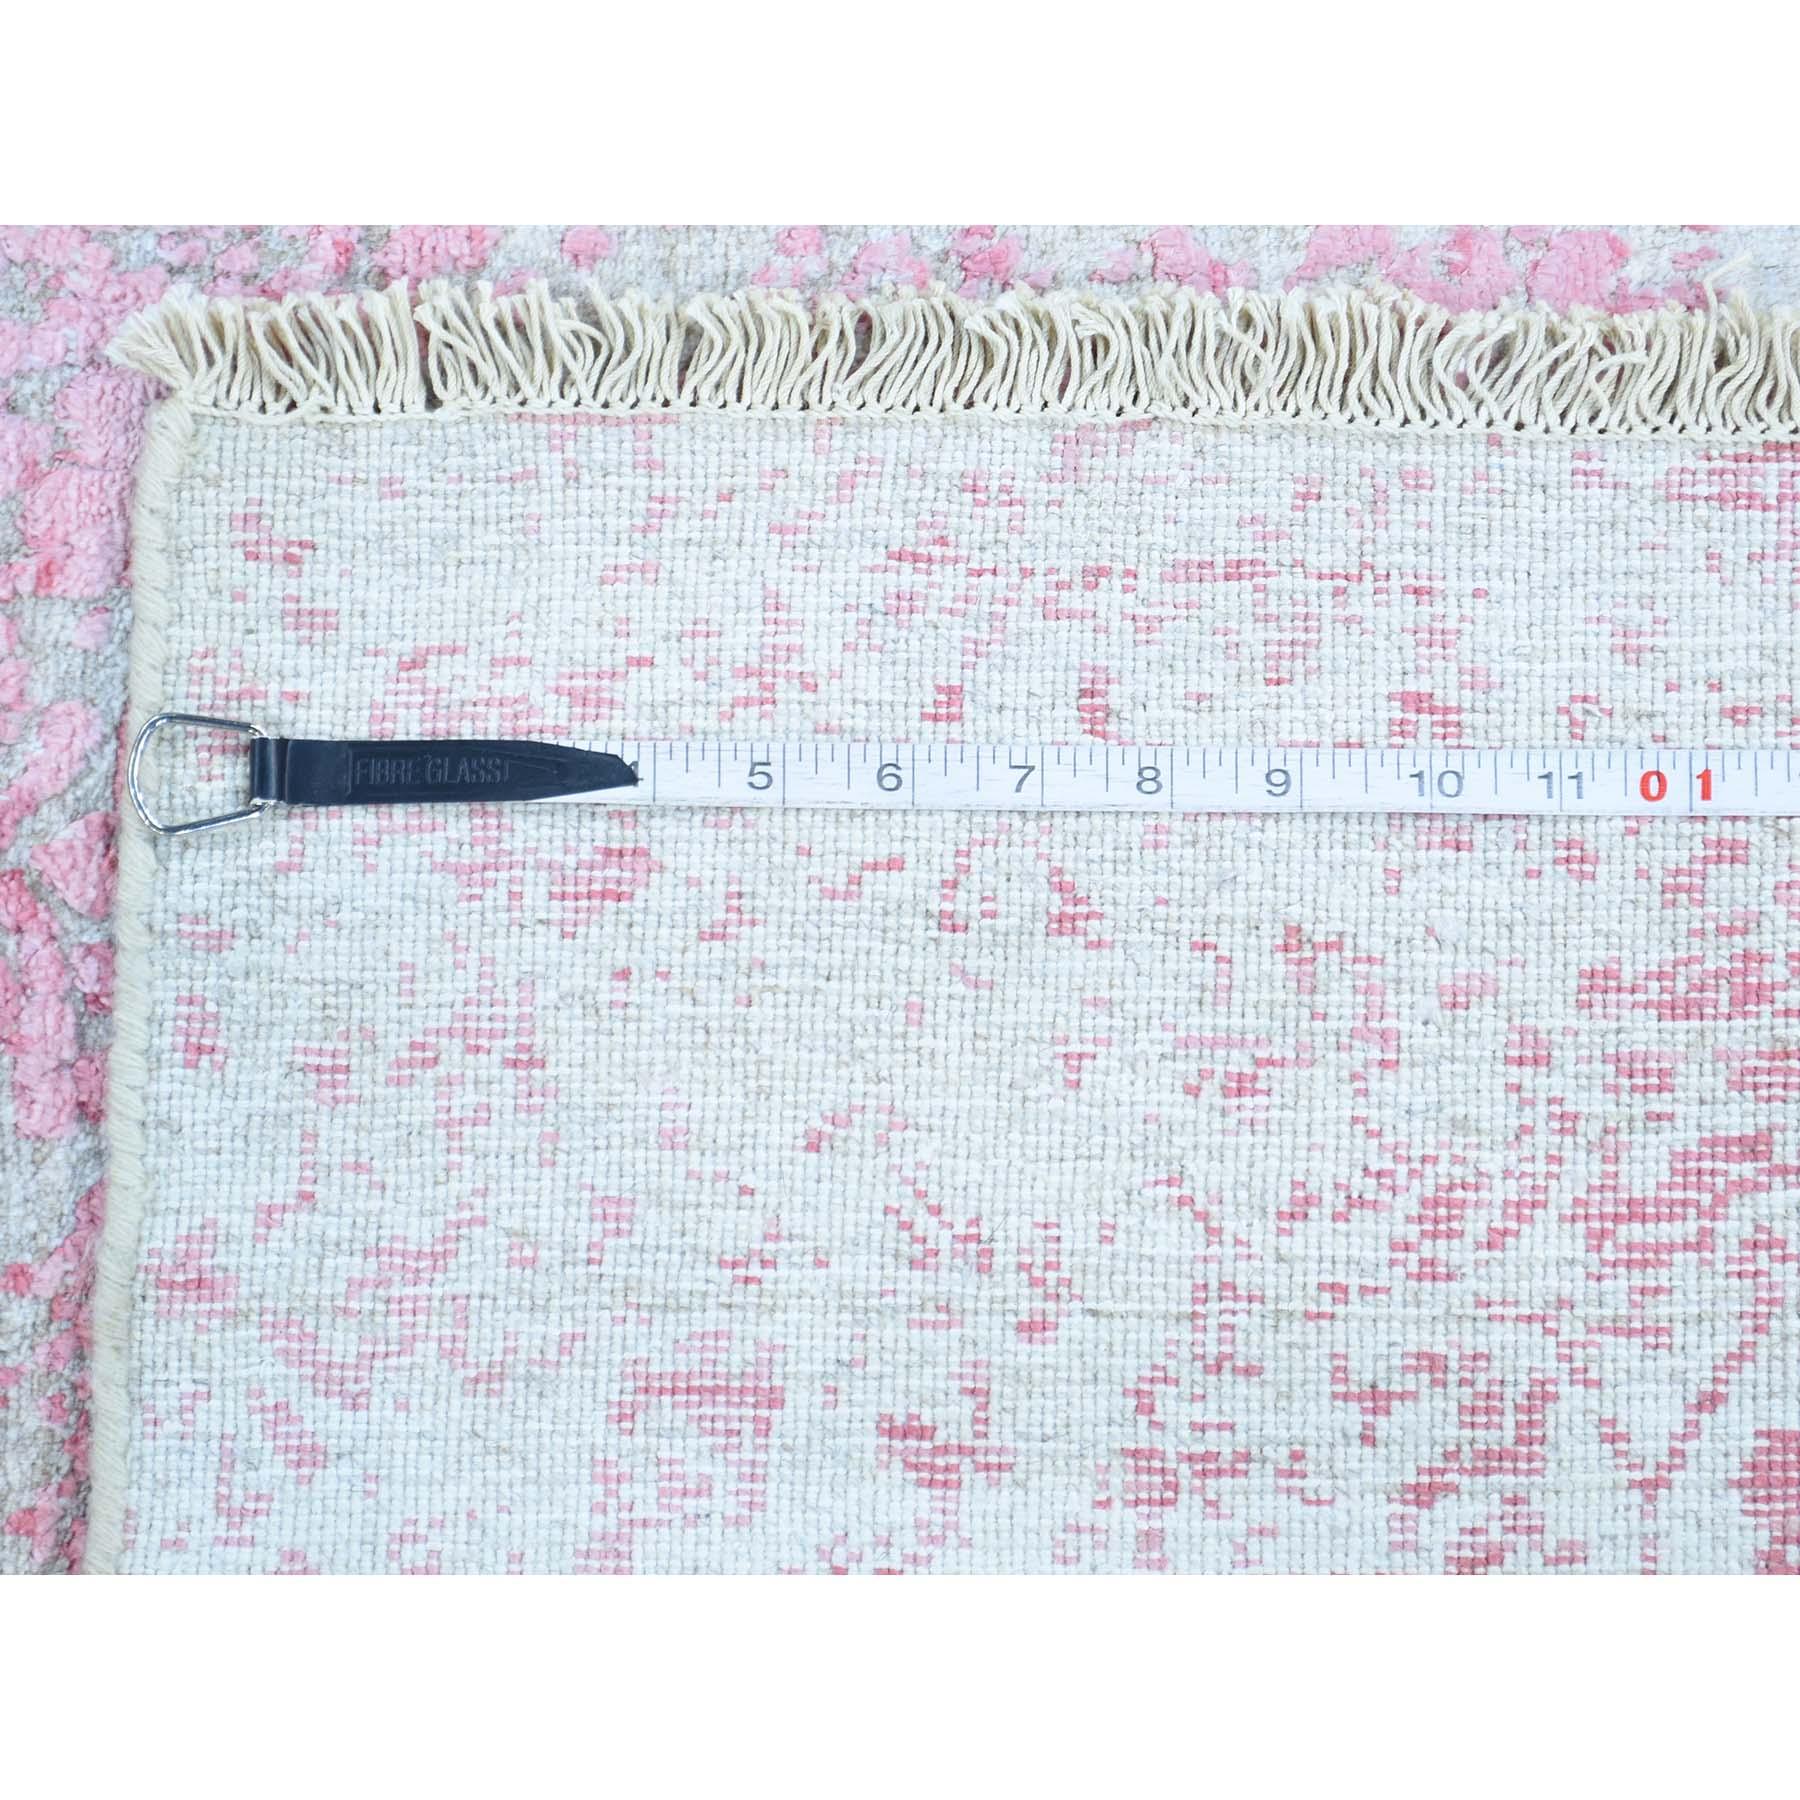 2-6 x9-6  Hand-Knotted Broken Persian Design Runner Wool and Silk Rug